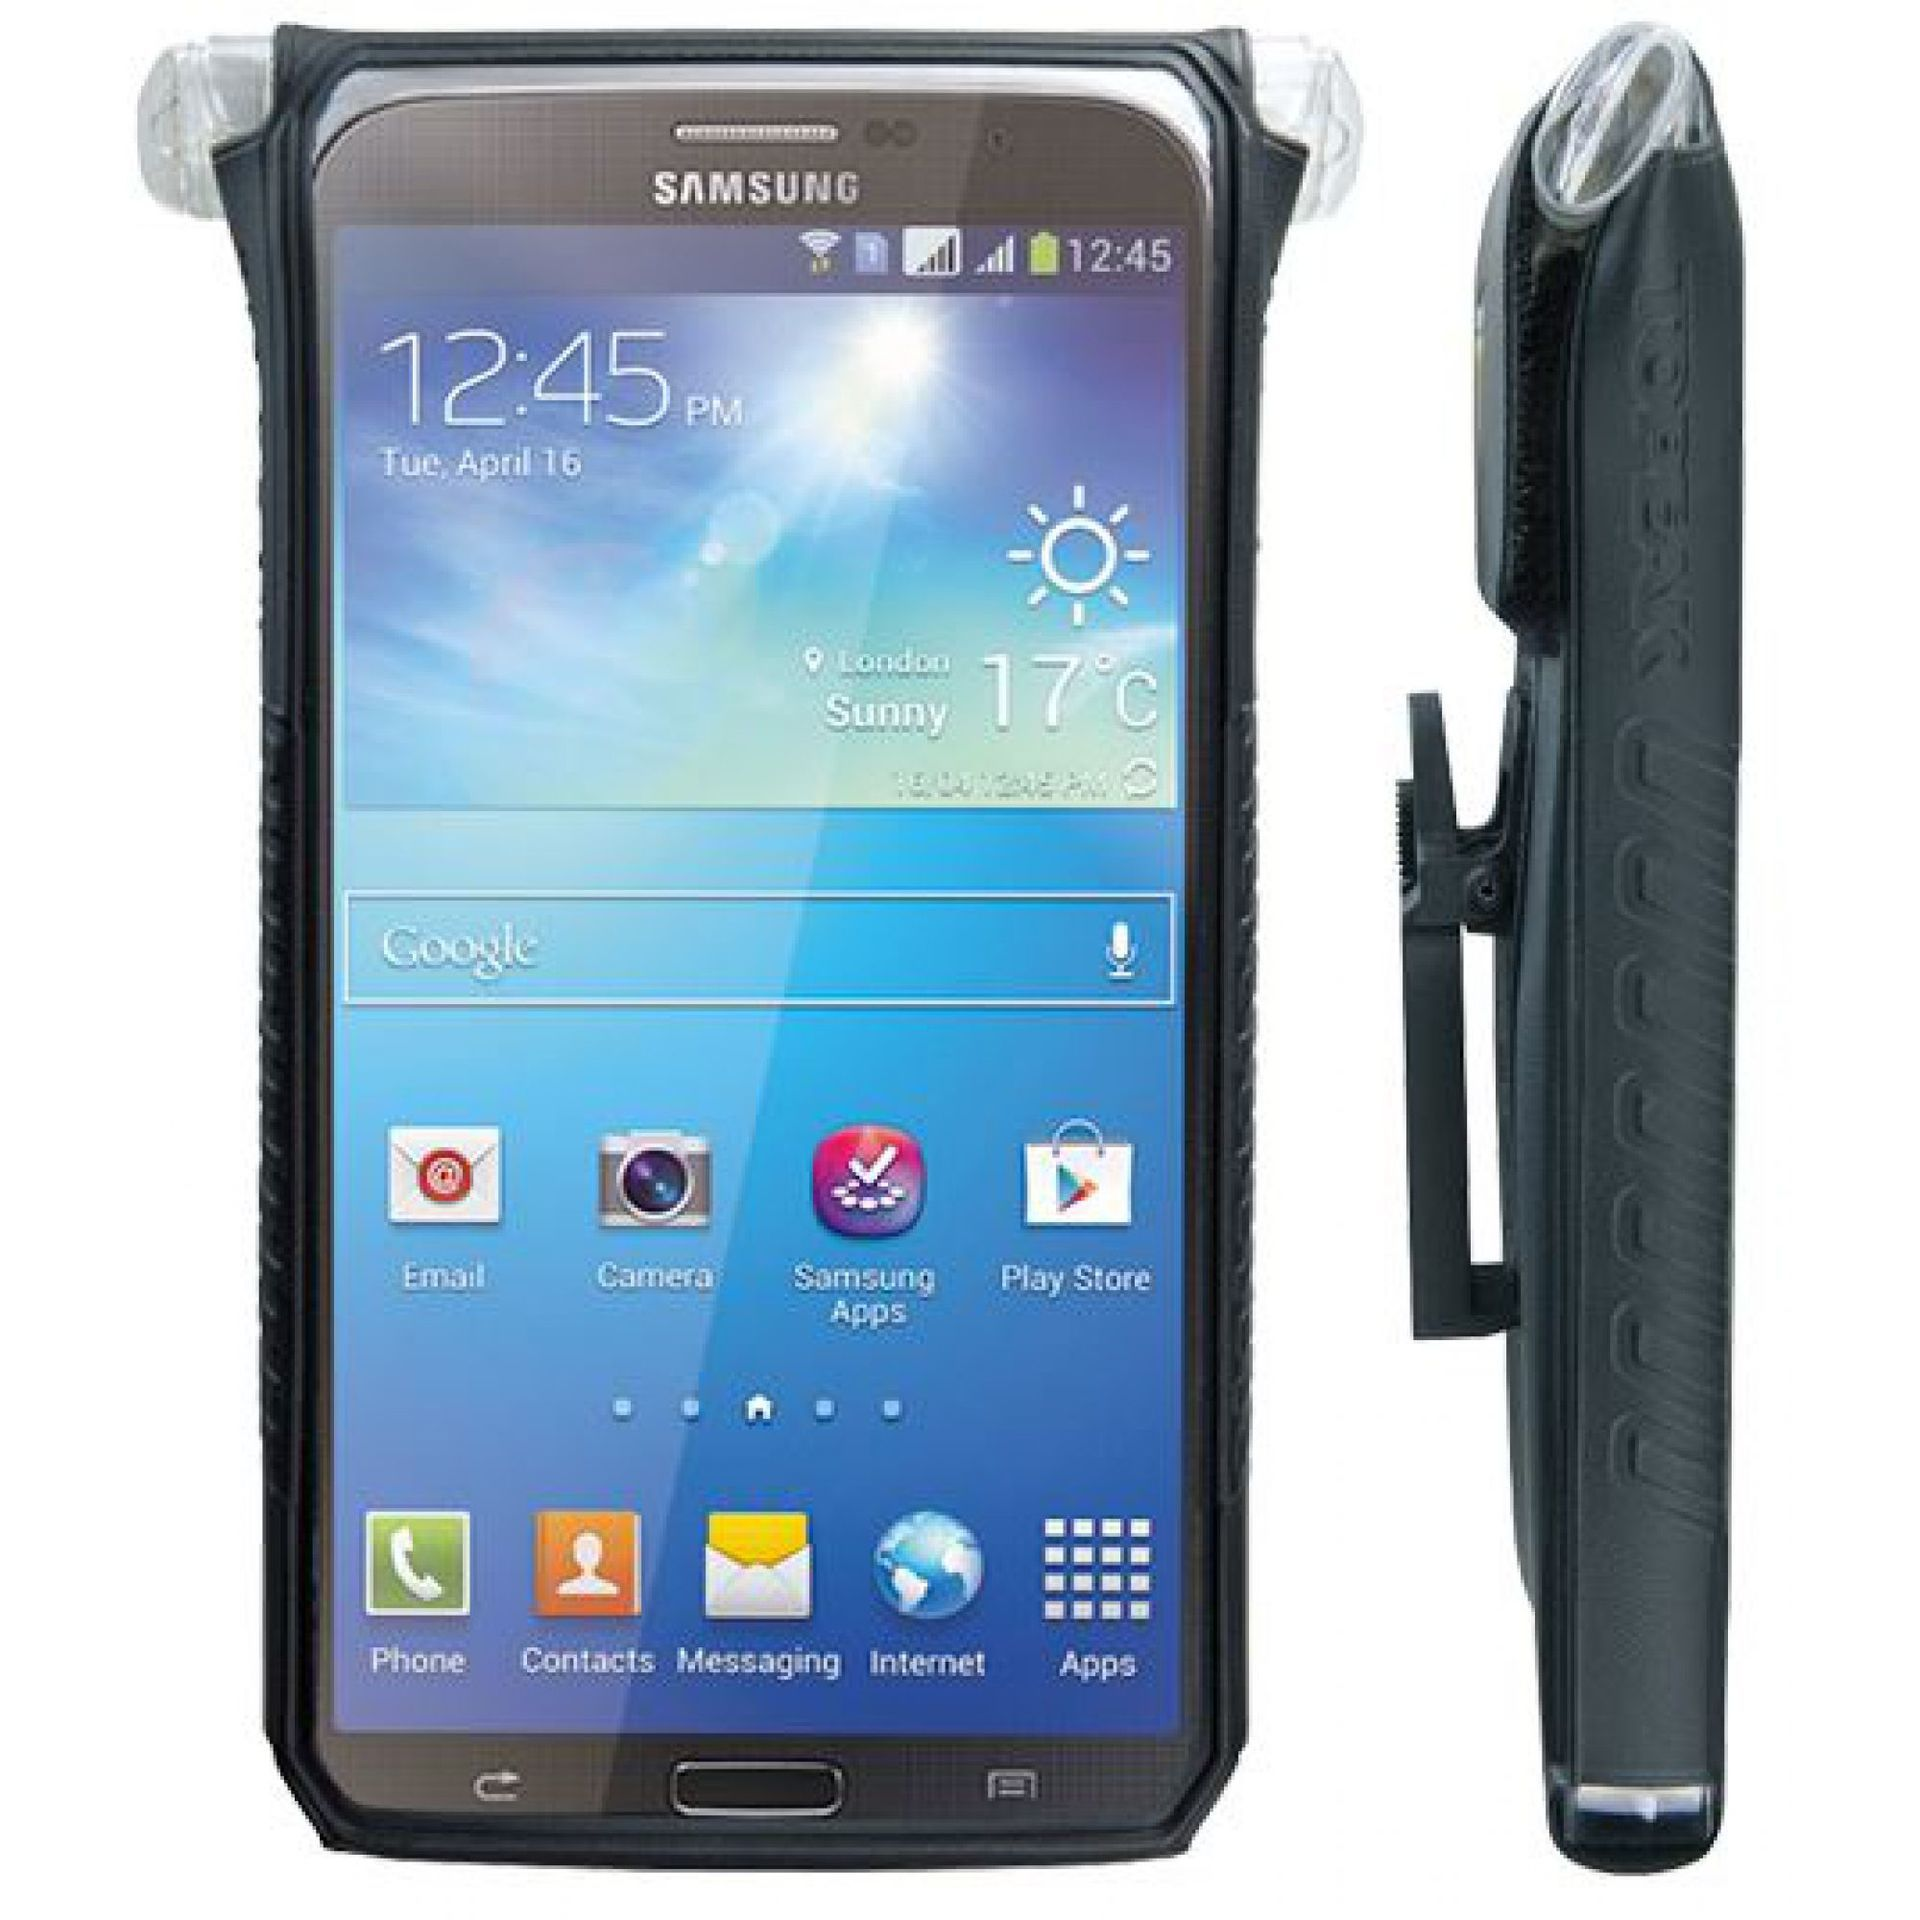 ROWEROWY POKROWIEC NA SMARTPHONA TOPEAK SMARTPHONE DRYBAG 6